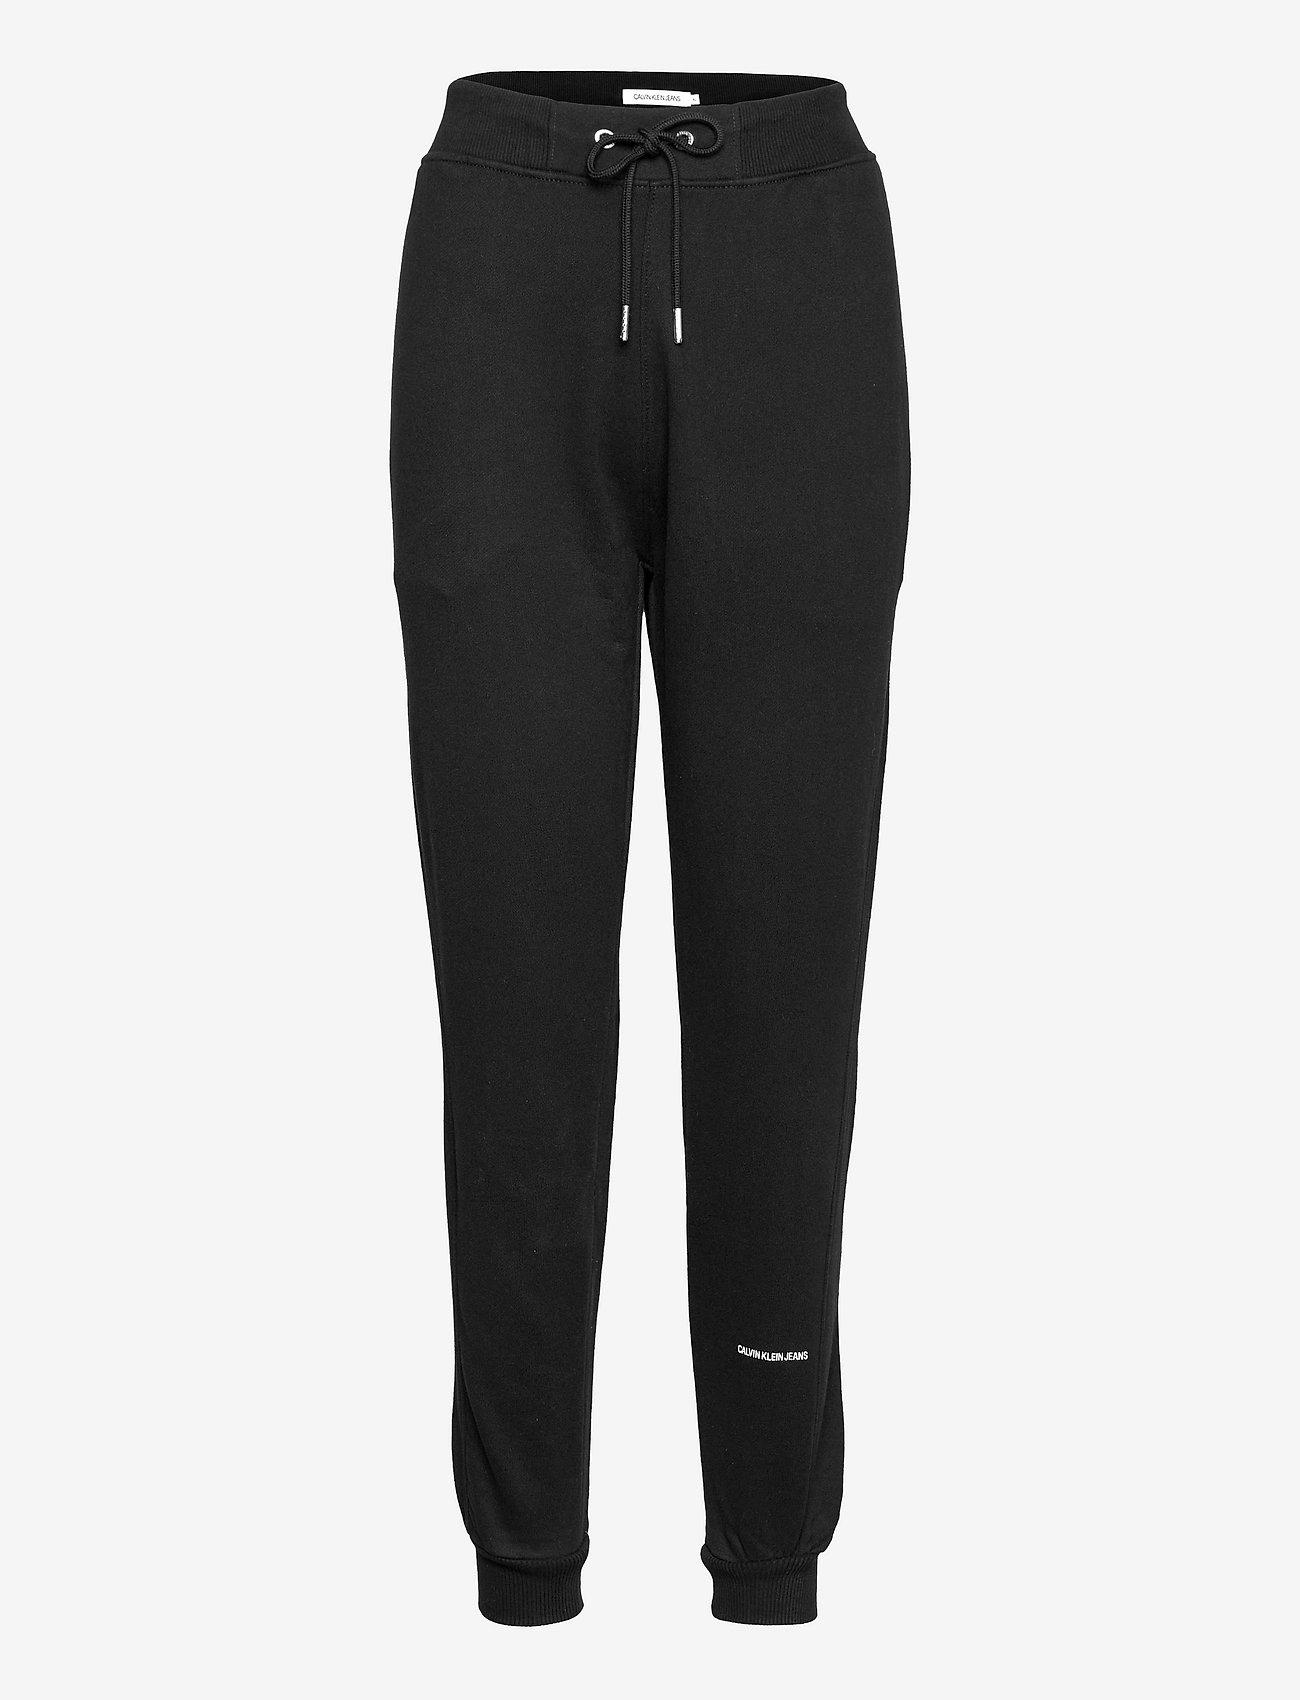 Calvin Klein Jeans - PLUS MICRO BRANDING JOGGING PANT - tøj - ck black - 0